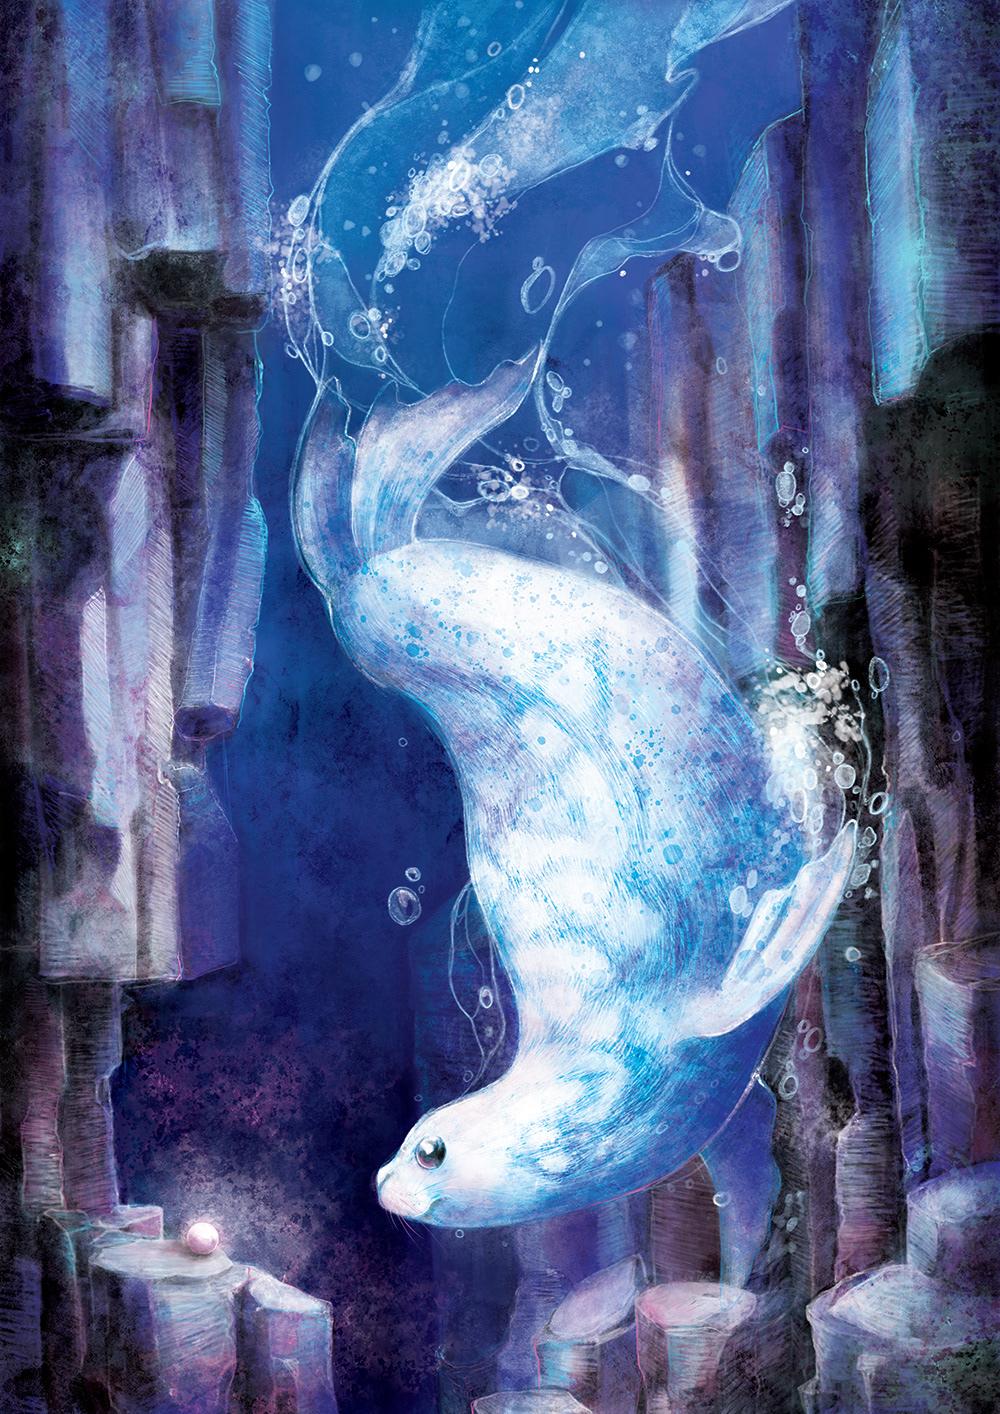 childrens book ILLUSTRATION  Magic   narrative scotland seal Selkie story